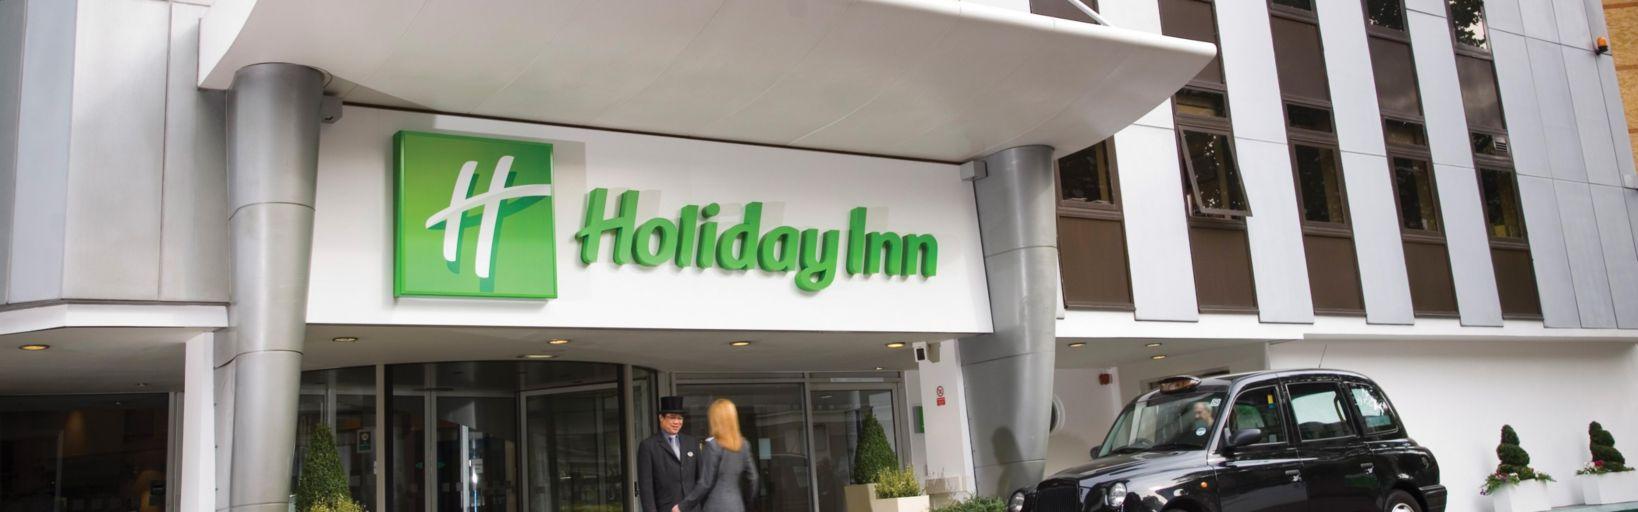 Holiday Inn London - Kensington Forum Hotel di IHG